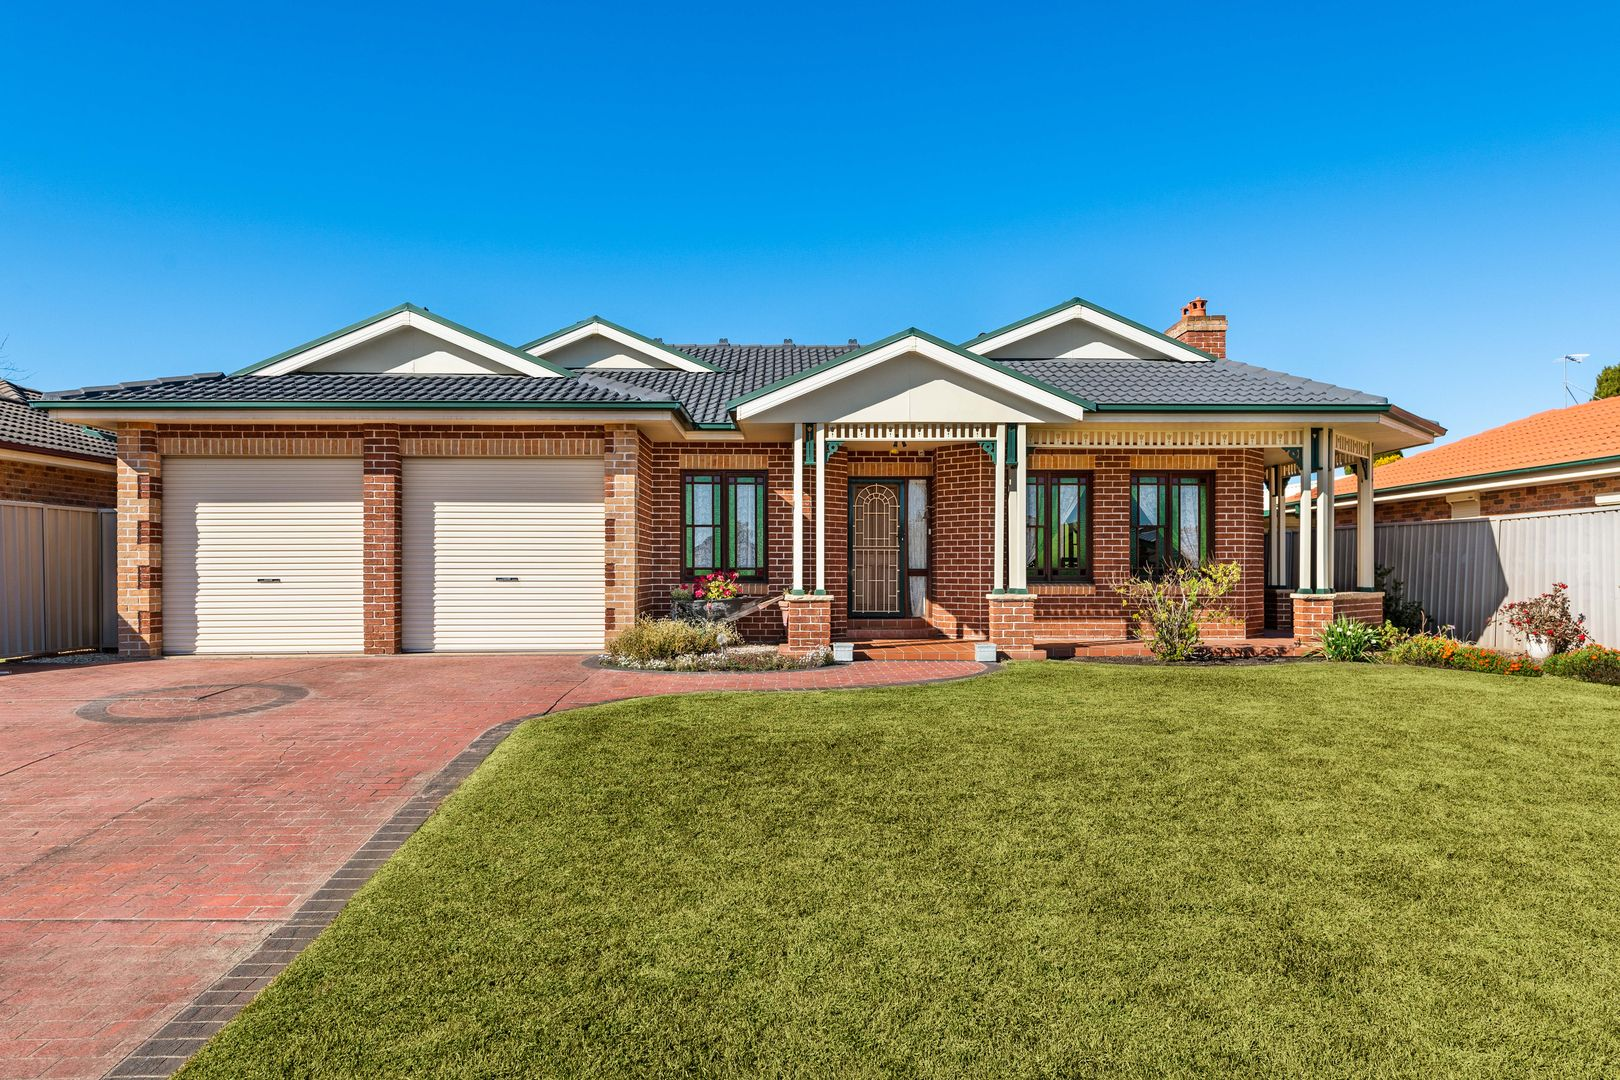 10 Stable View Place, Narellan NSW 2567, Image 0